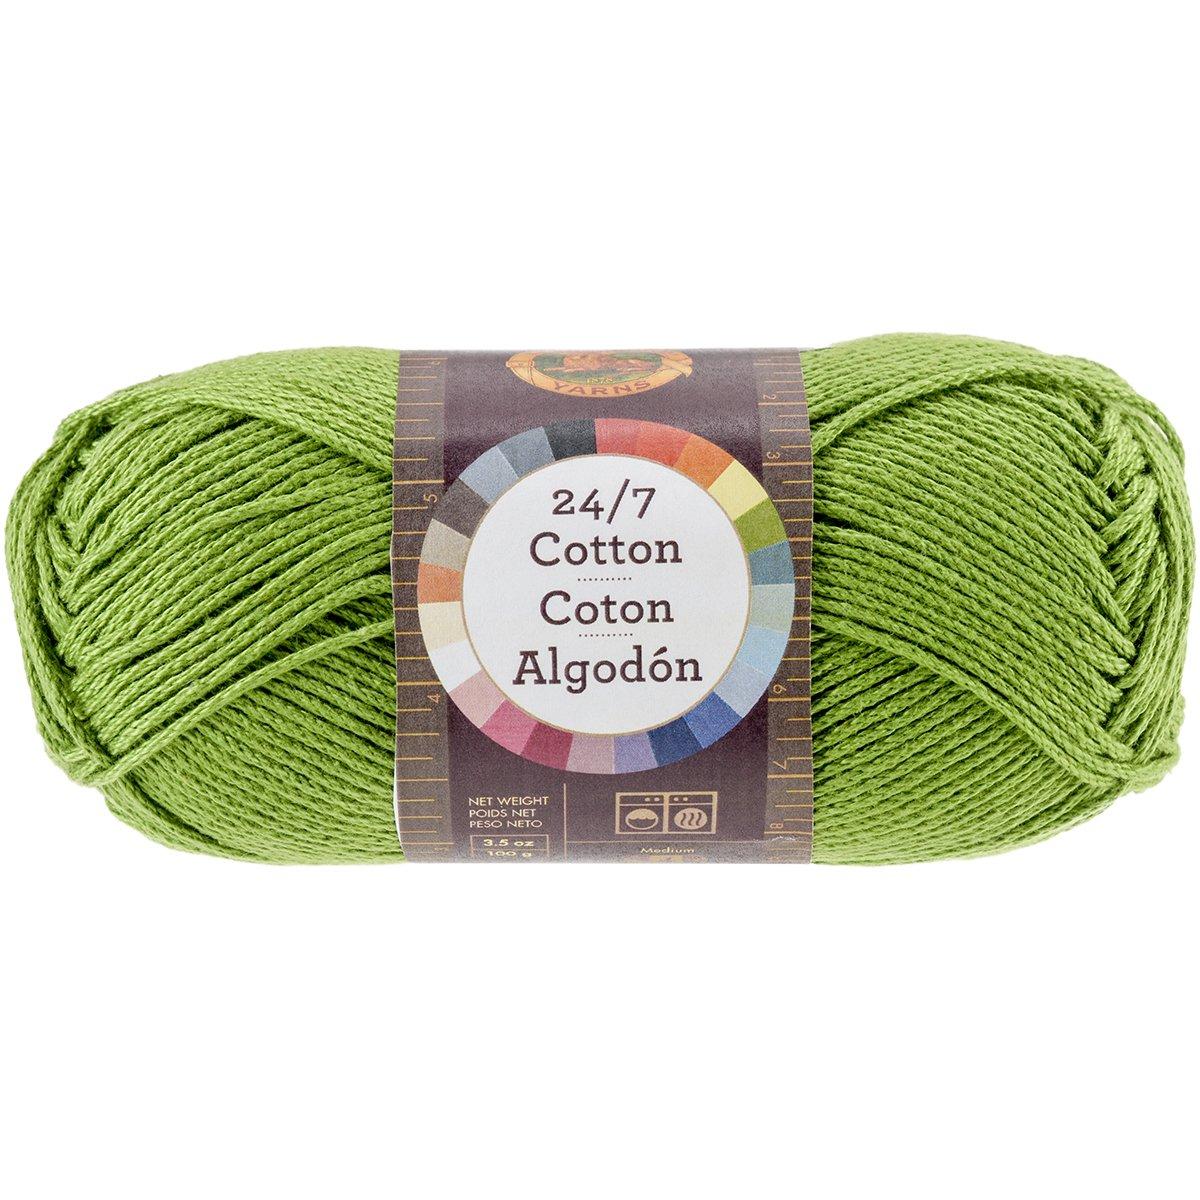 Aqua Lion Brand Yarn Company Fil de Coton 100/% Coton